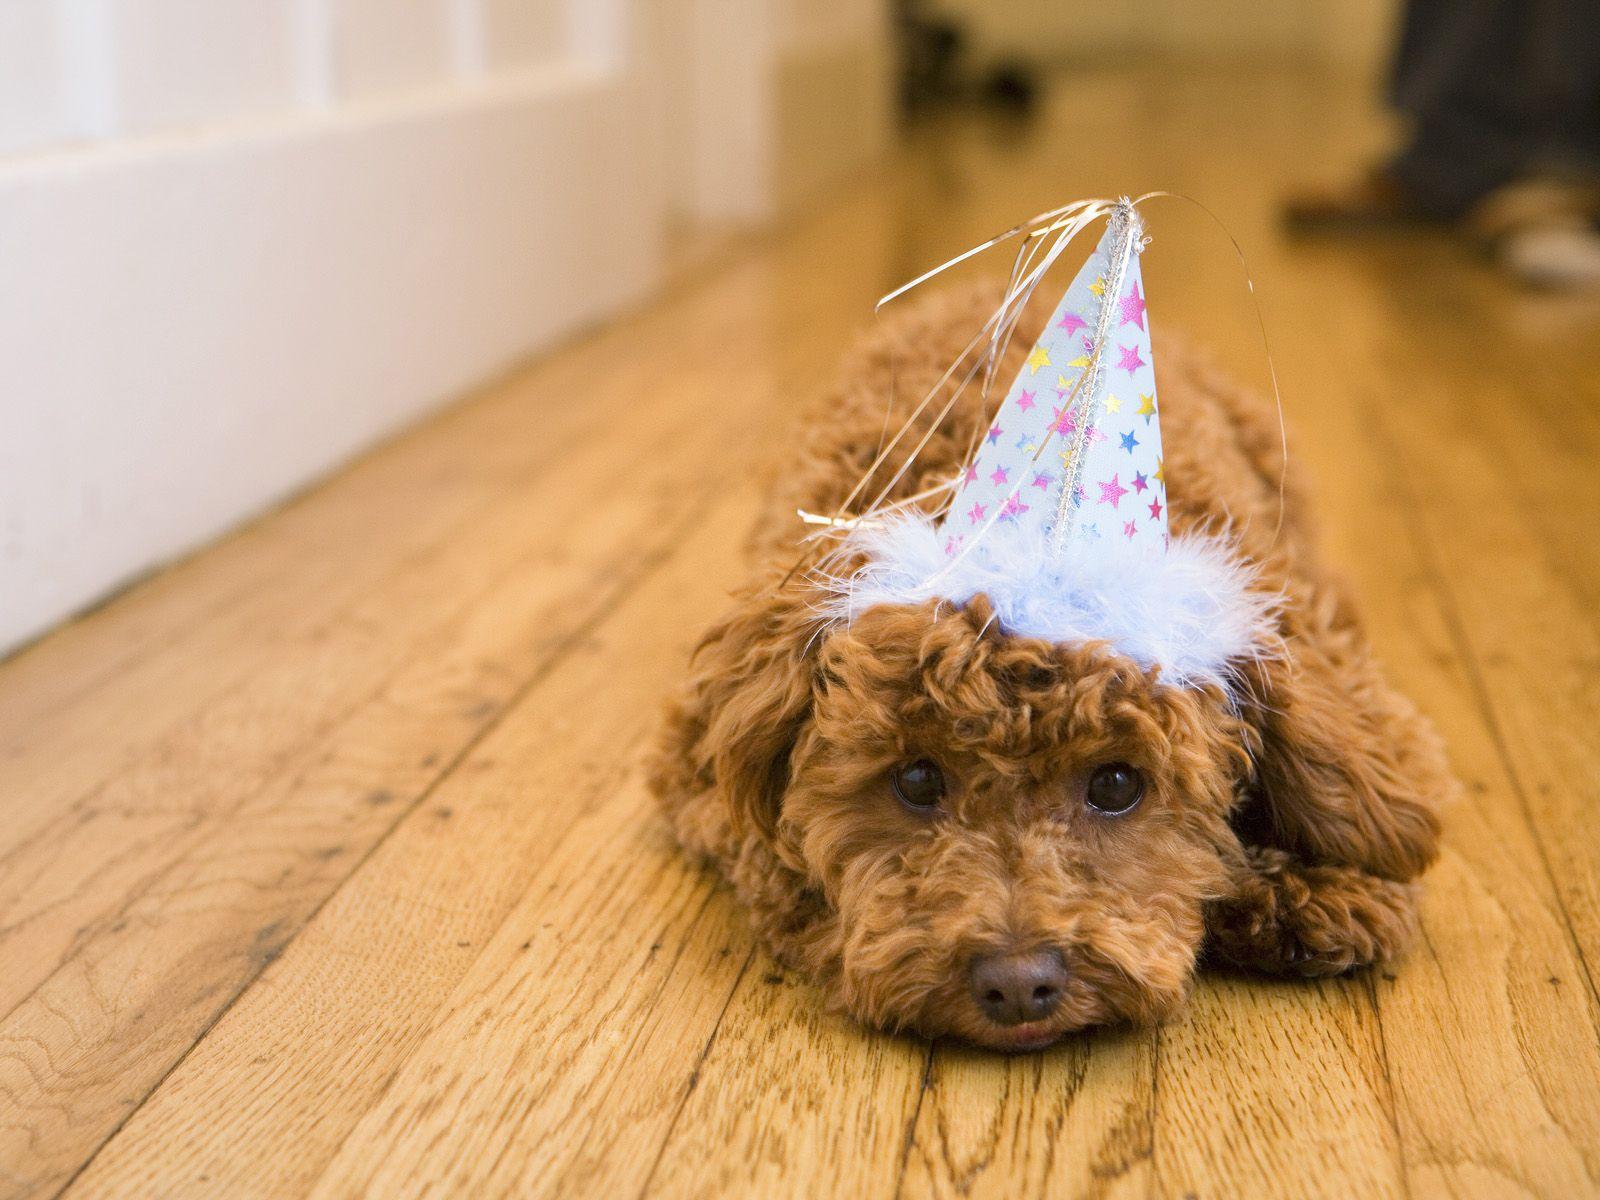 animals wearing birthday hats - photo #25